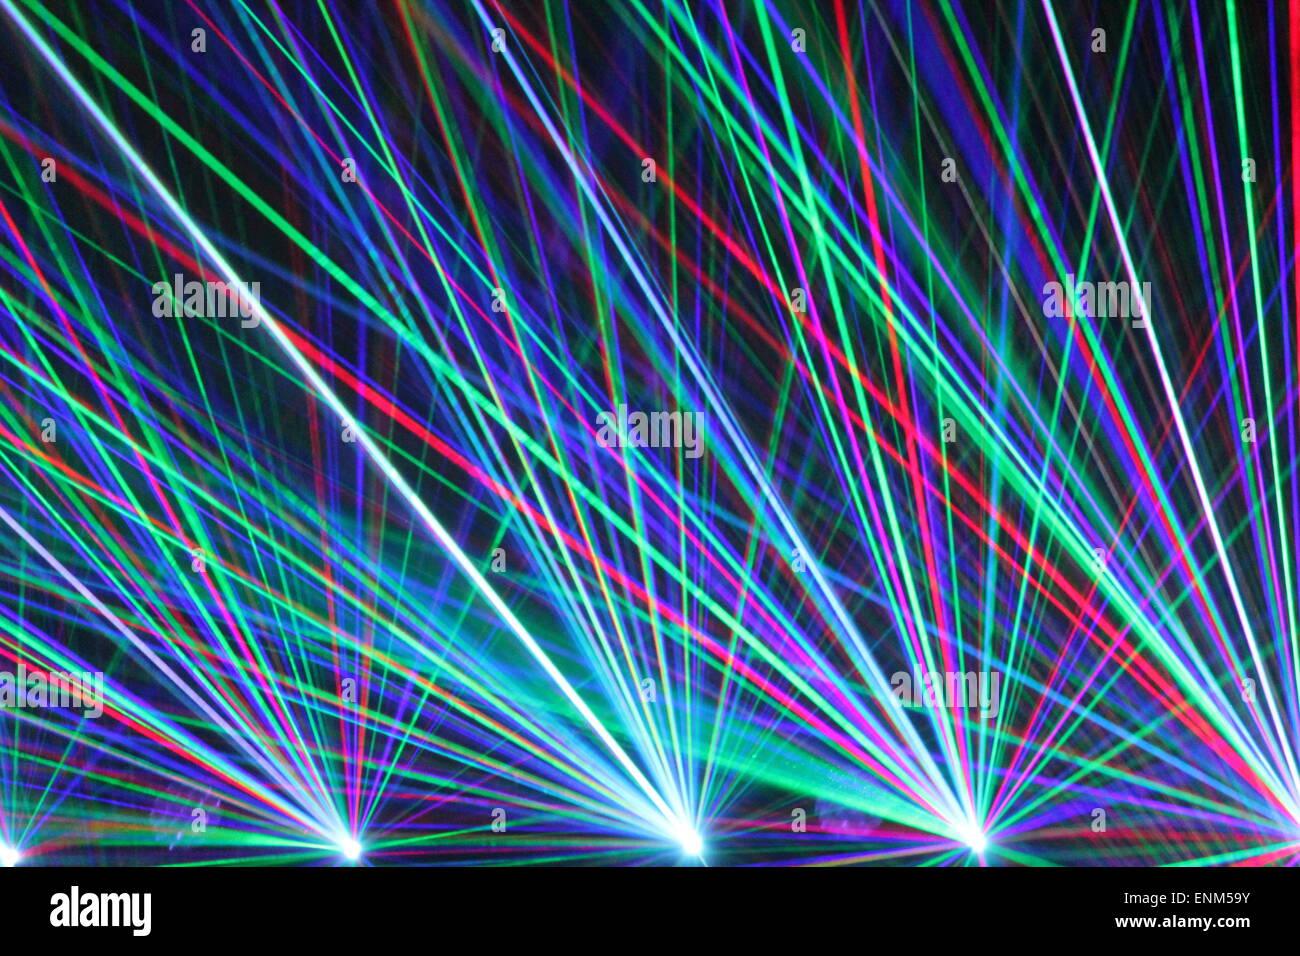 Fancy Club Light Effects In A Dark Background Stock: Laser Lights In Nightclub Laser, Light, Club, Clubbing